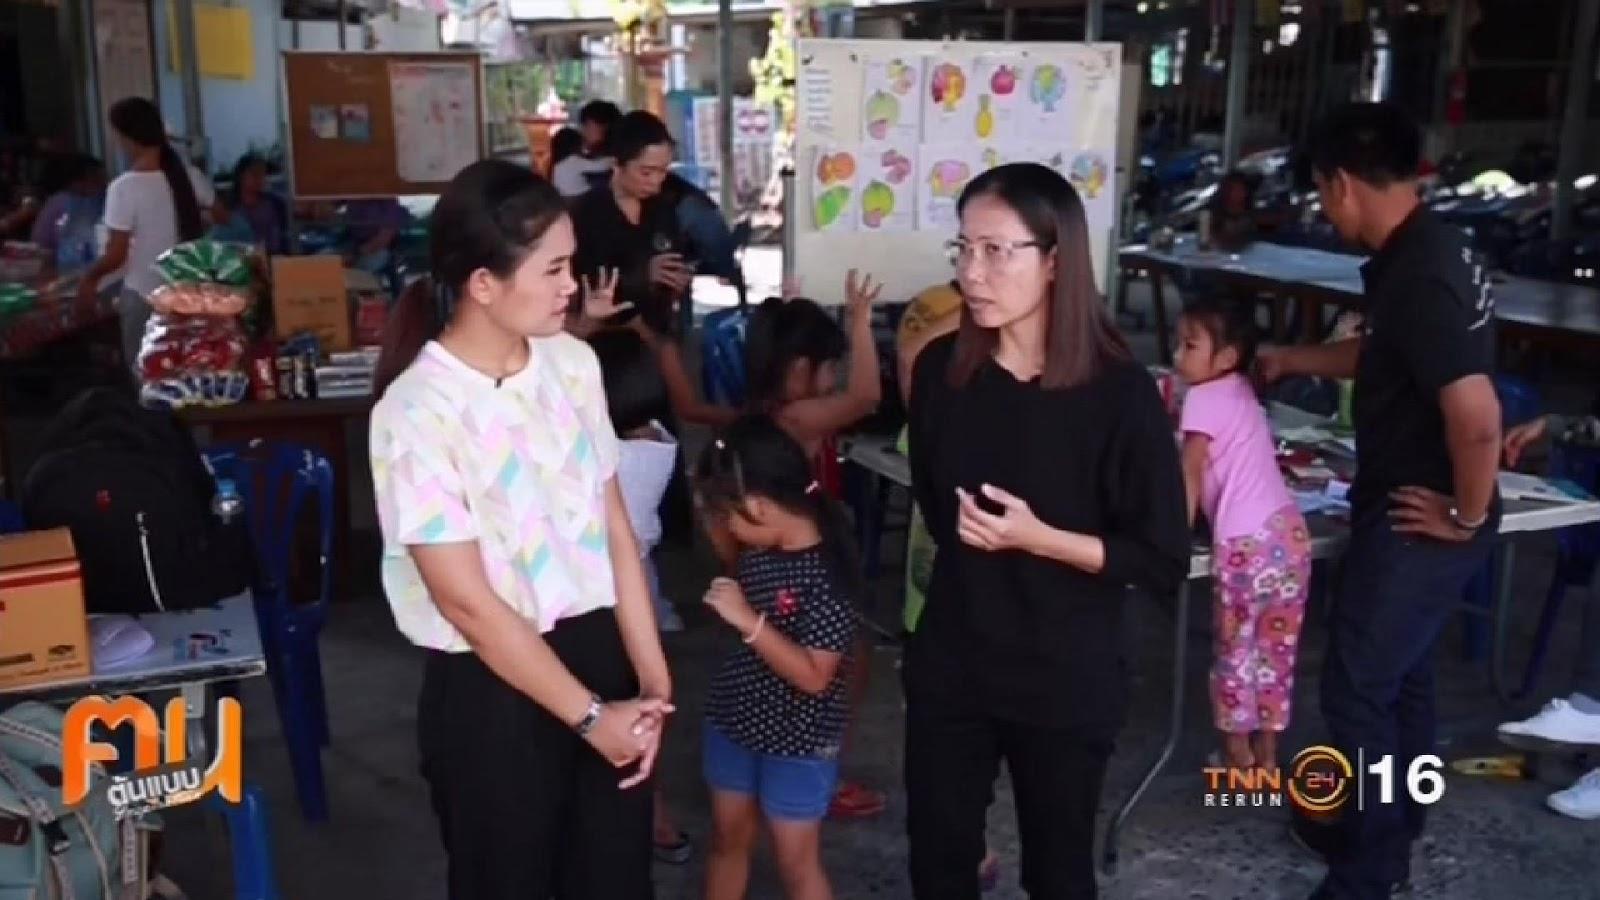 Frekuensi siaran TNN24 Thailand di satelit Thaicom 6 Terbaru